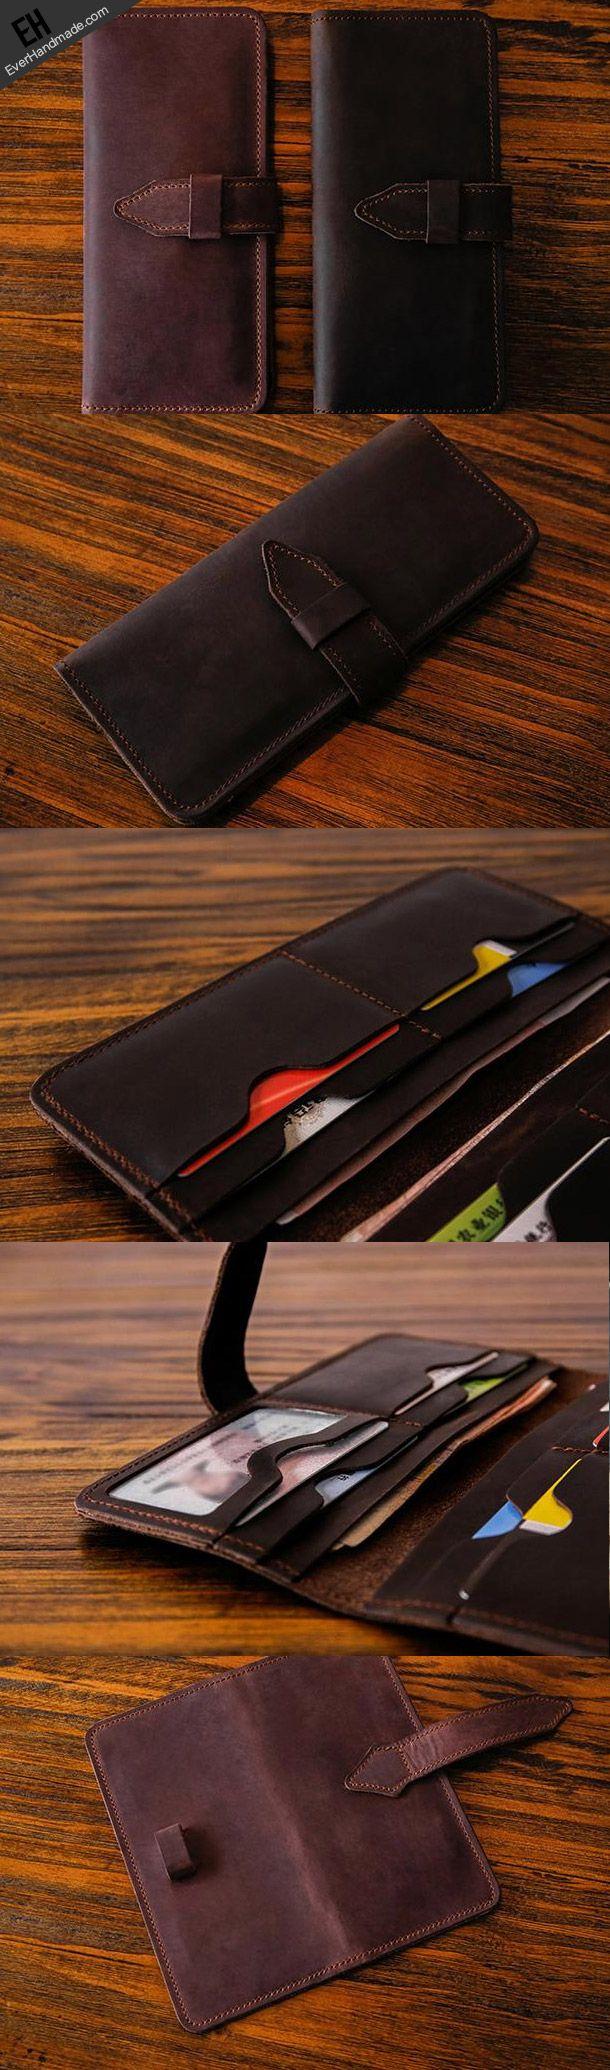 Handmade vintage purse leather wallet long phone wallet clutch wallet coffee